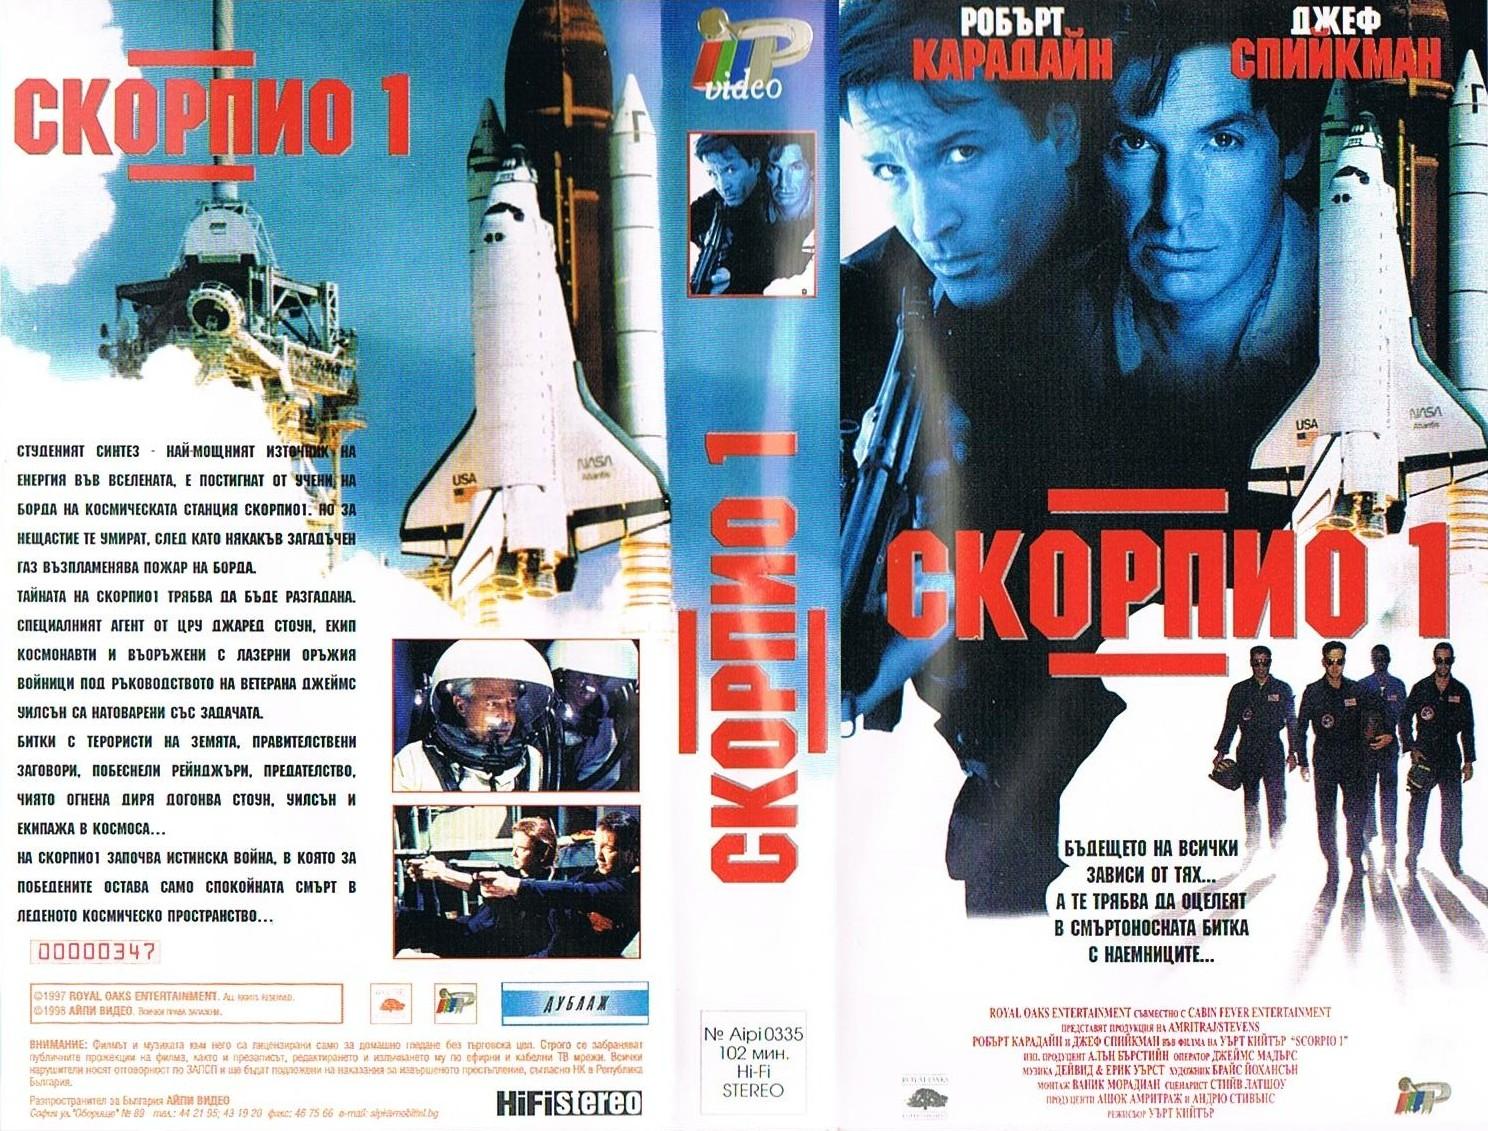 Скорпио 1 филм робърт карадайн